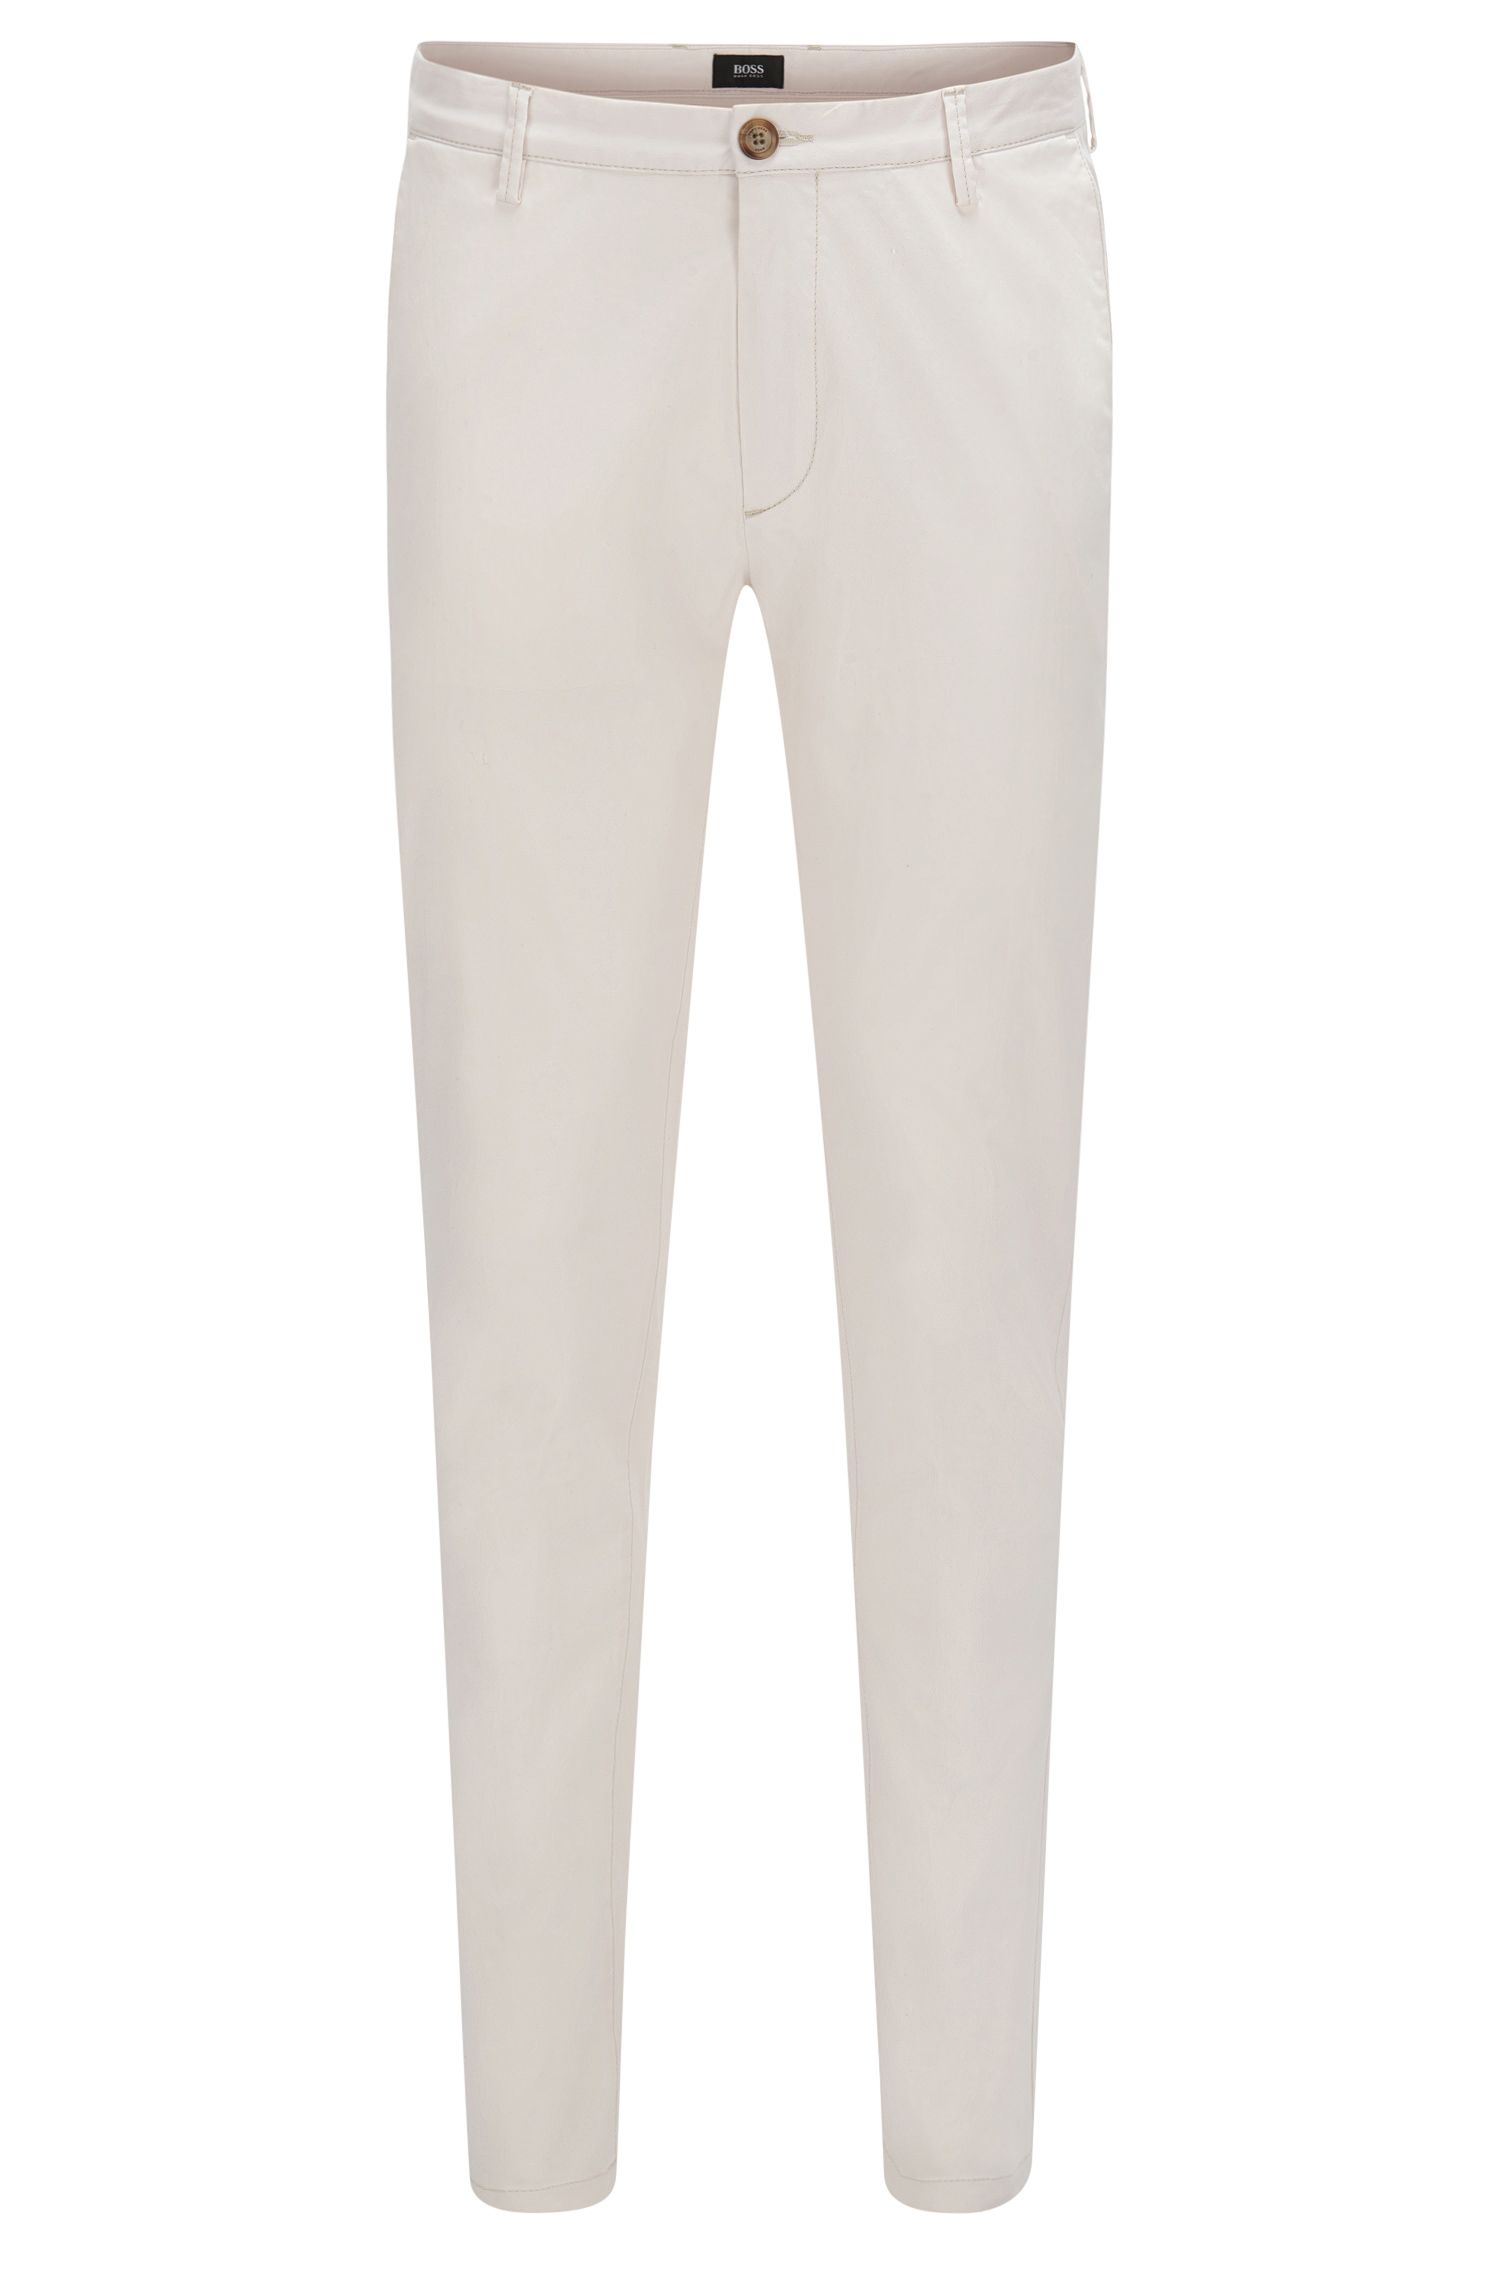 'Rice W' | Slim Fit, Stretch Cotton Pants